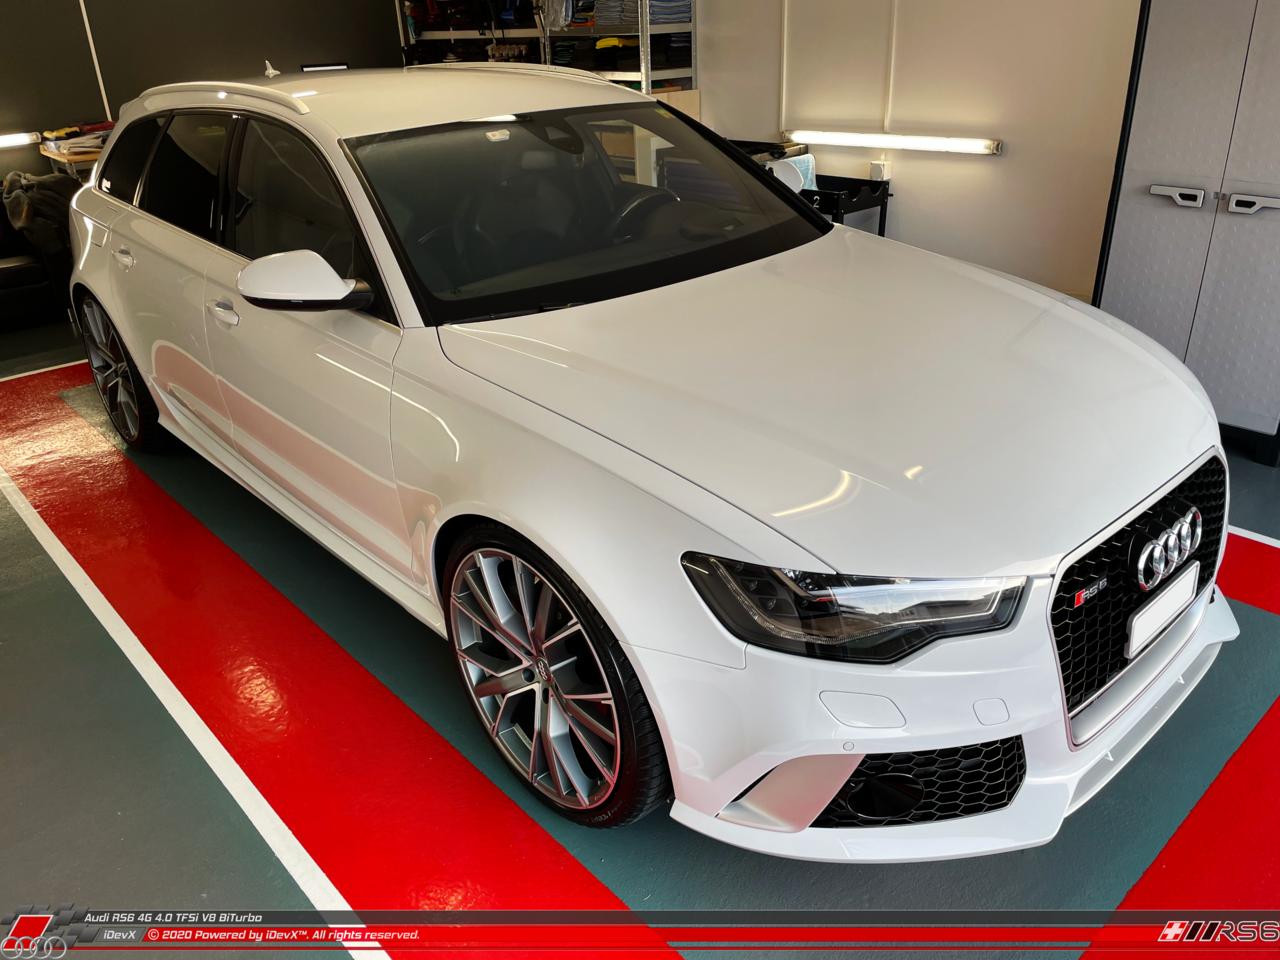 19.02.2021_Audi-RS6_iDevX_002.png